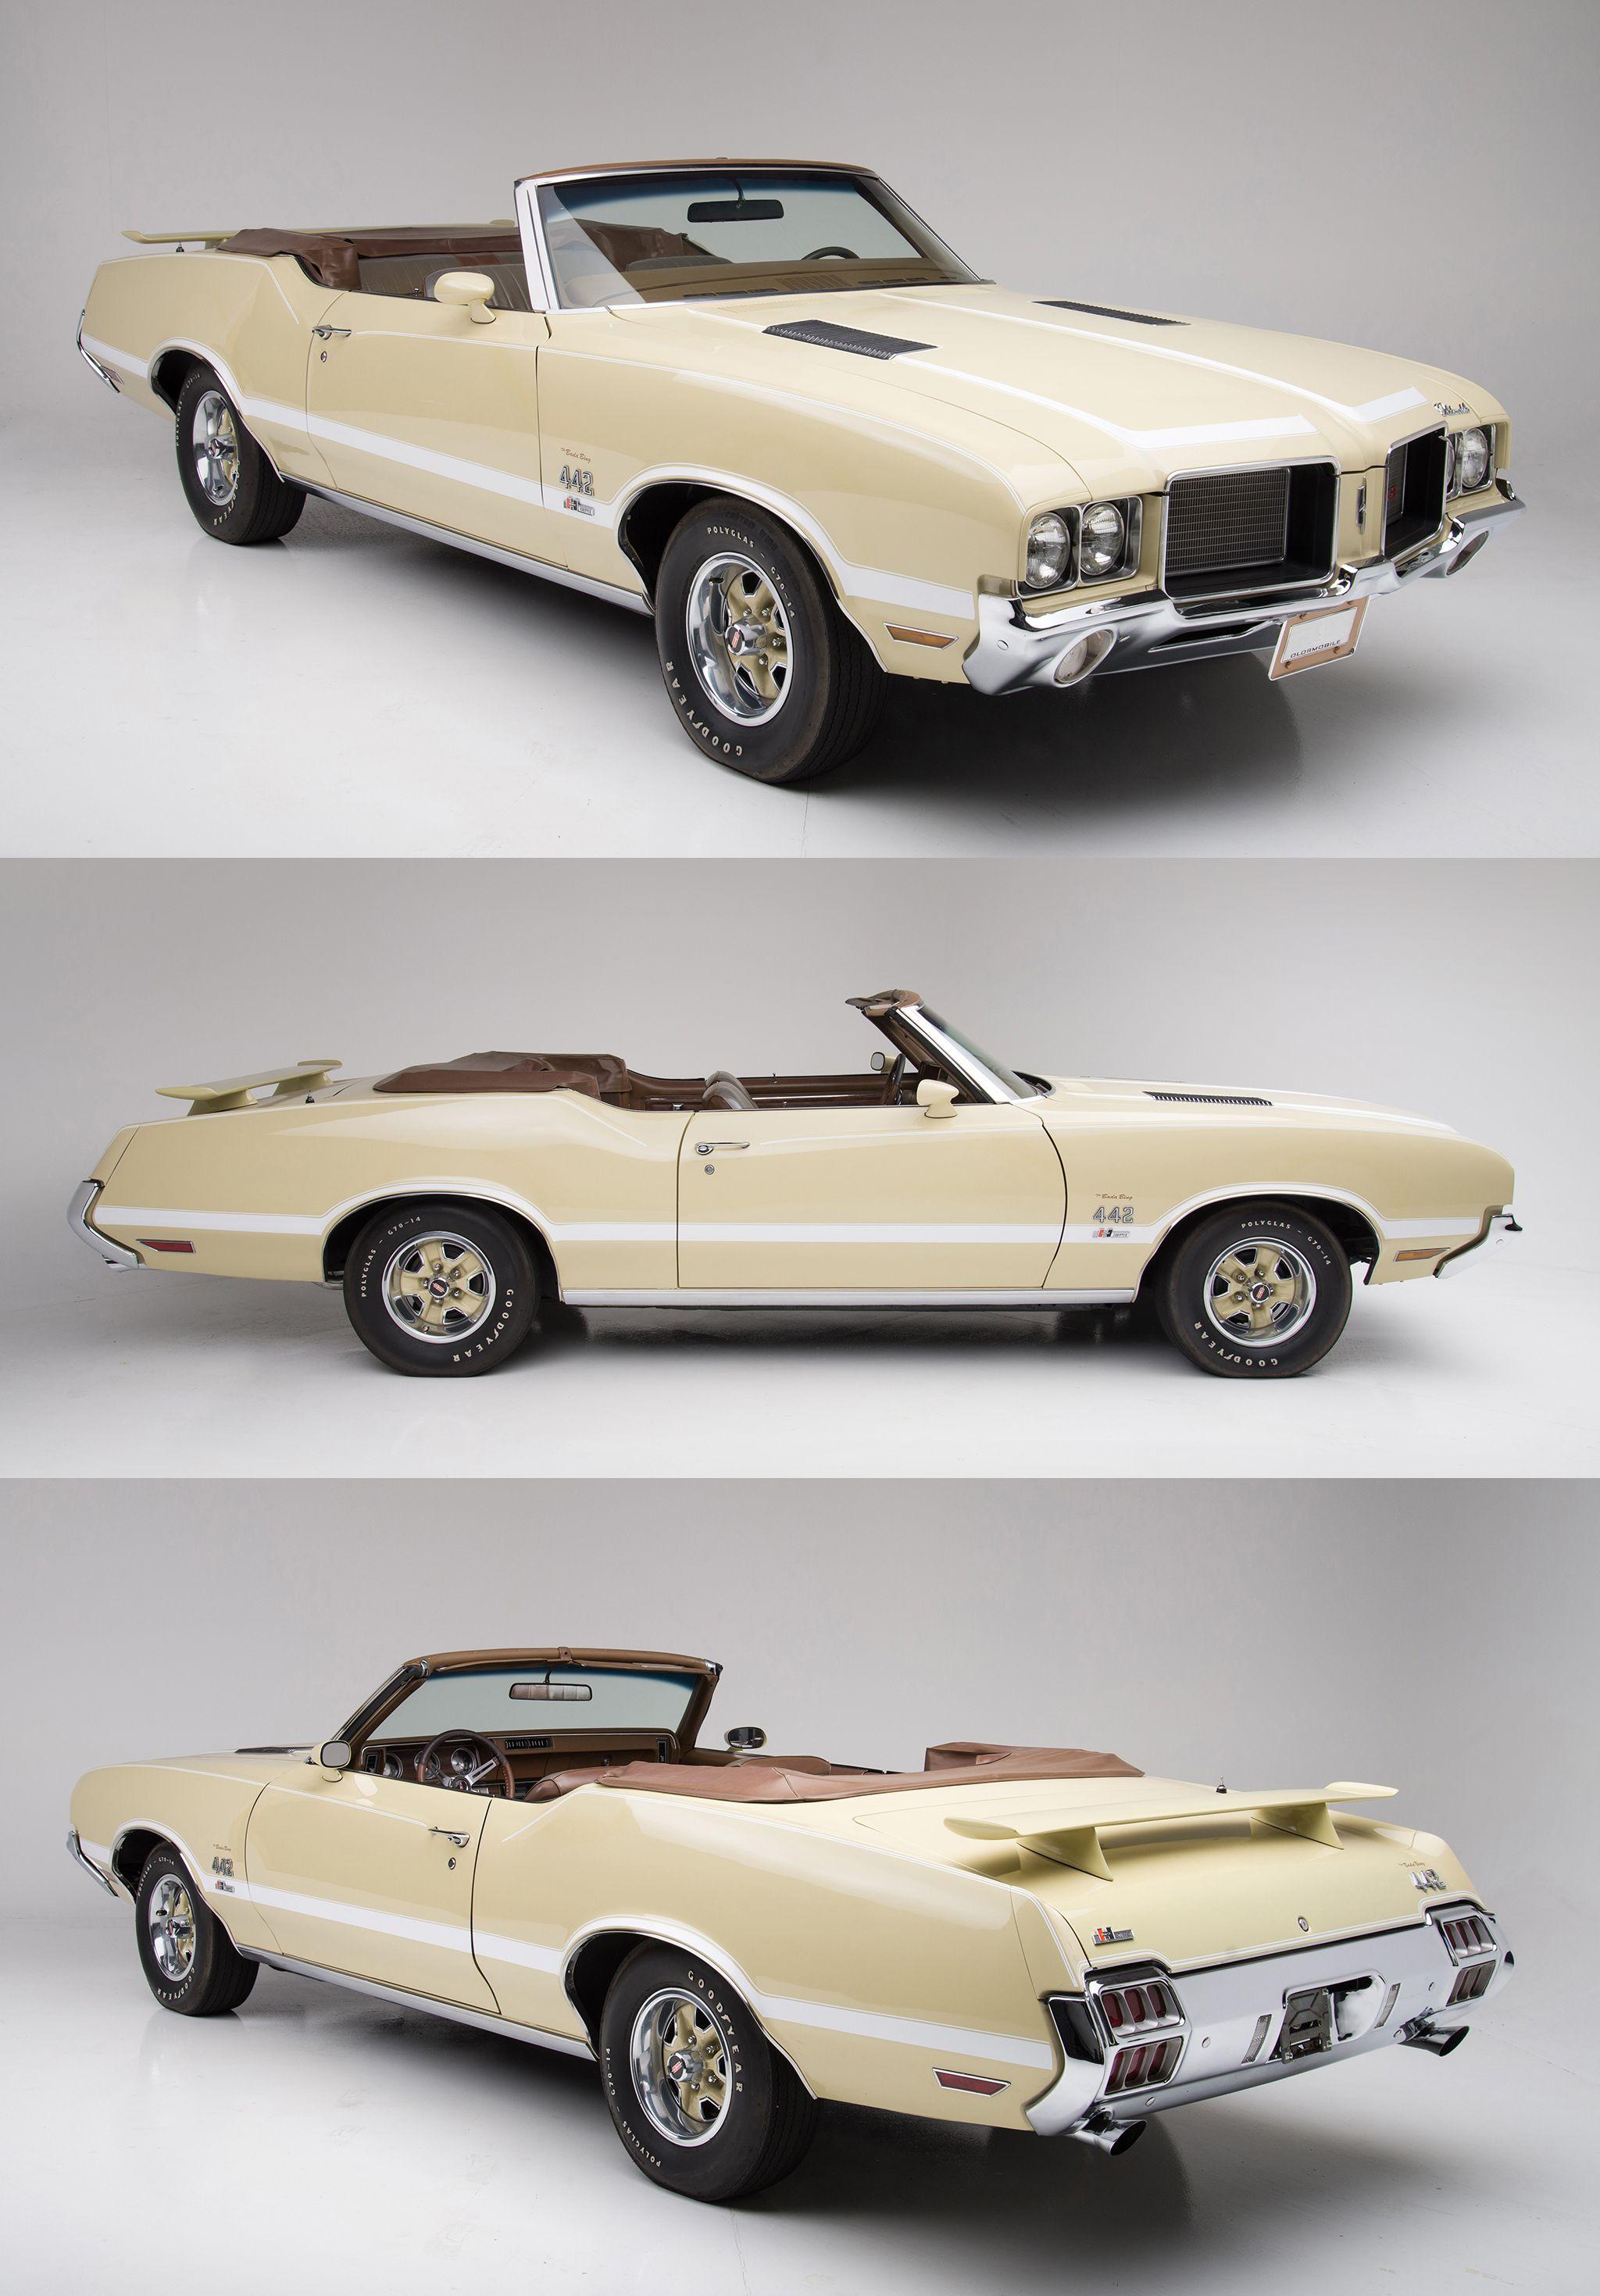 1972 442 : Oldsmobile, Cutlass, Supreme, Hurst, Convertible, ☆。☆。JpM, ENTERTAINMENT, ☆。☆。, Classic, Muscle,, Retro, Cars,, American